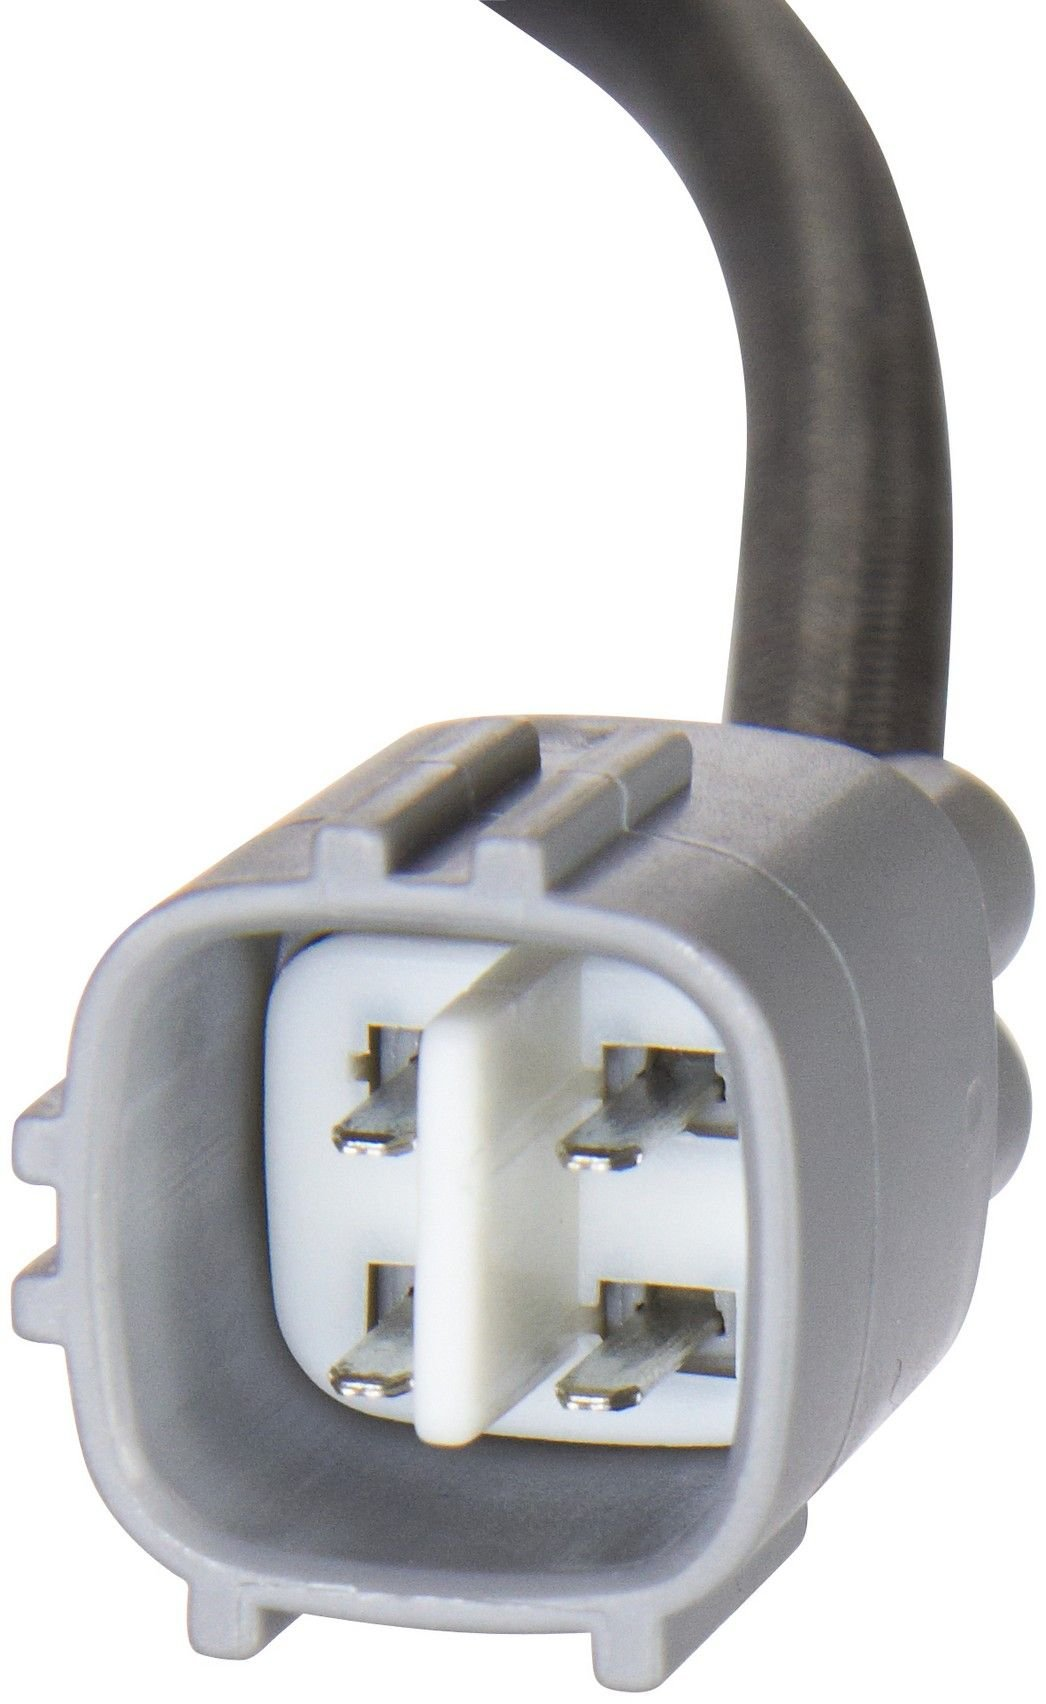 Toyota Camry Oxygen Sensor Replacement (Bosch, Delphi, Denso